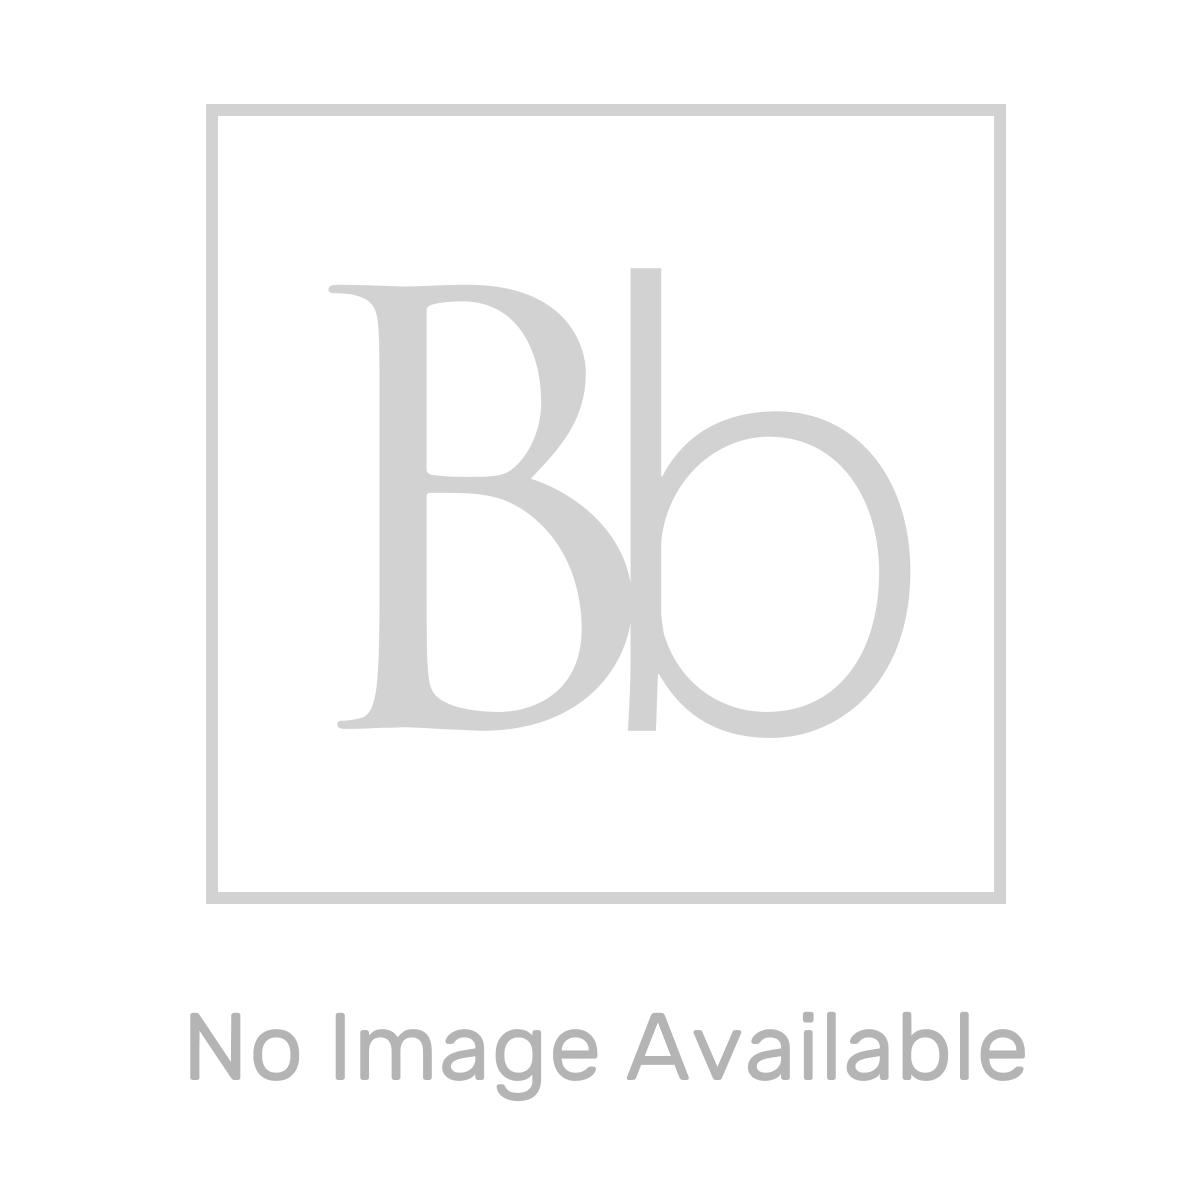 Tavistock Vitoria Close Coupled Toilet - Natural Oak Seat